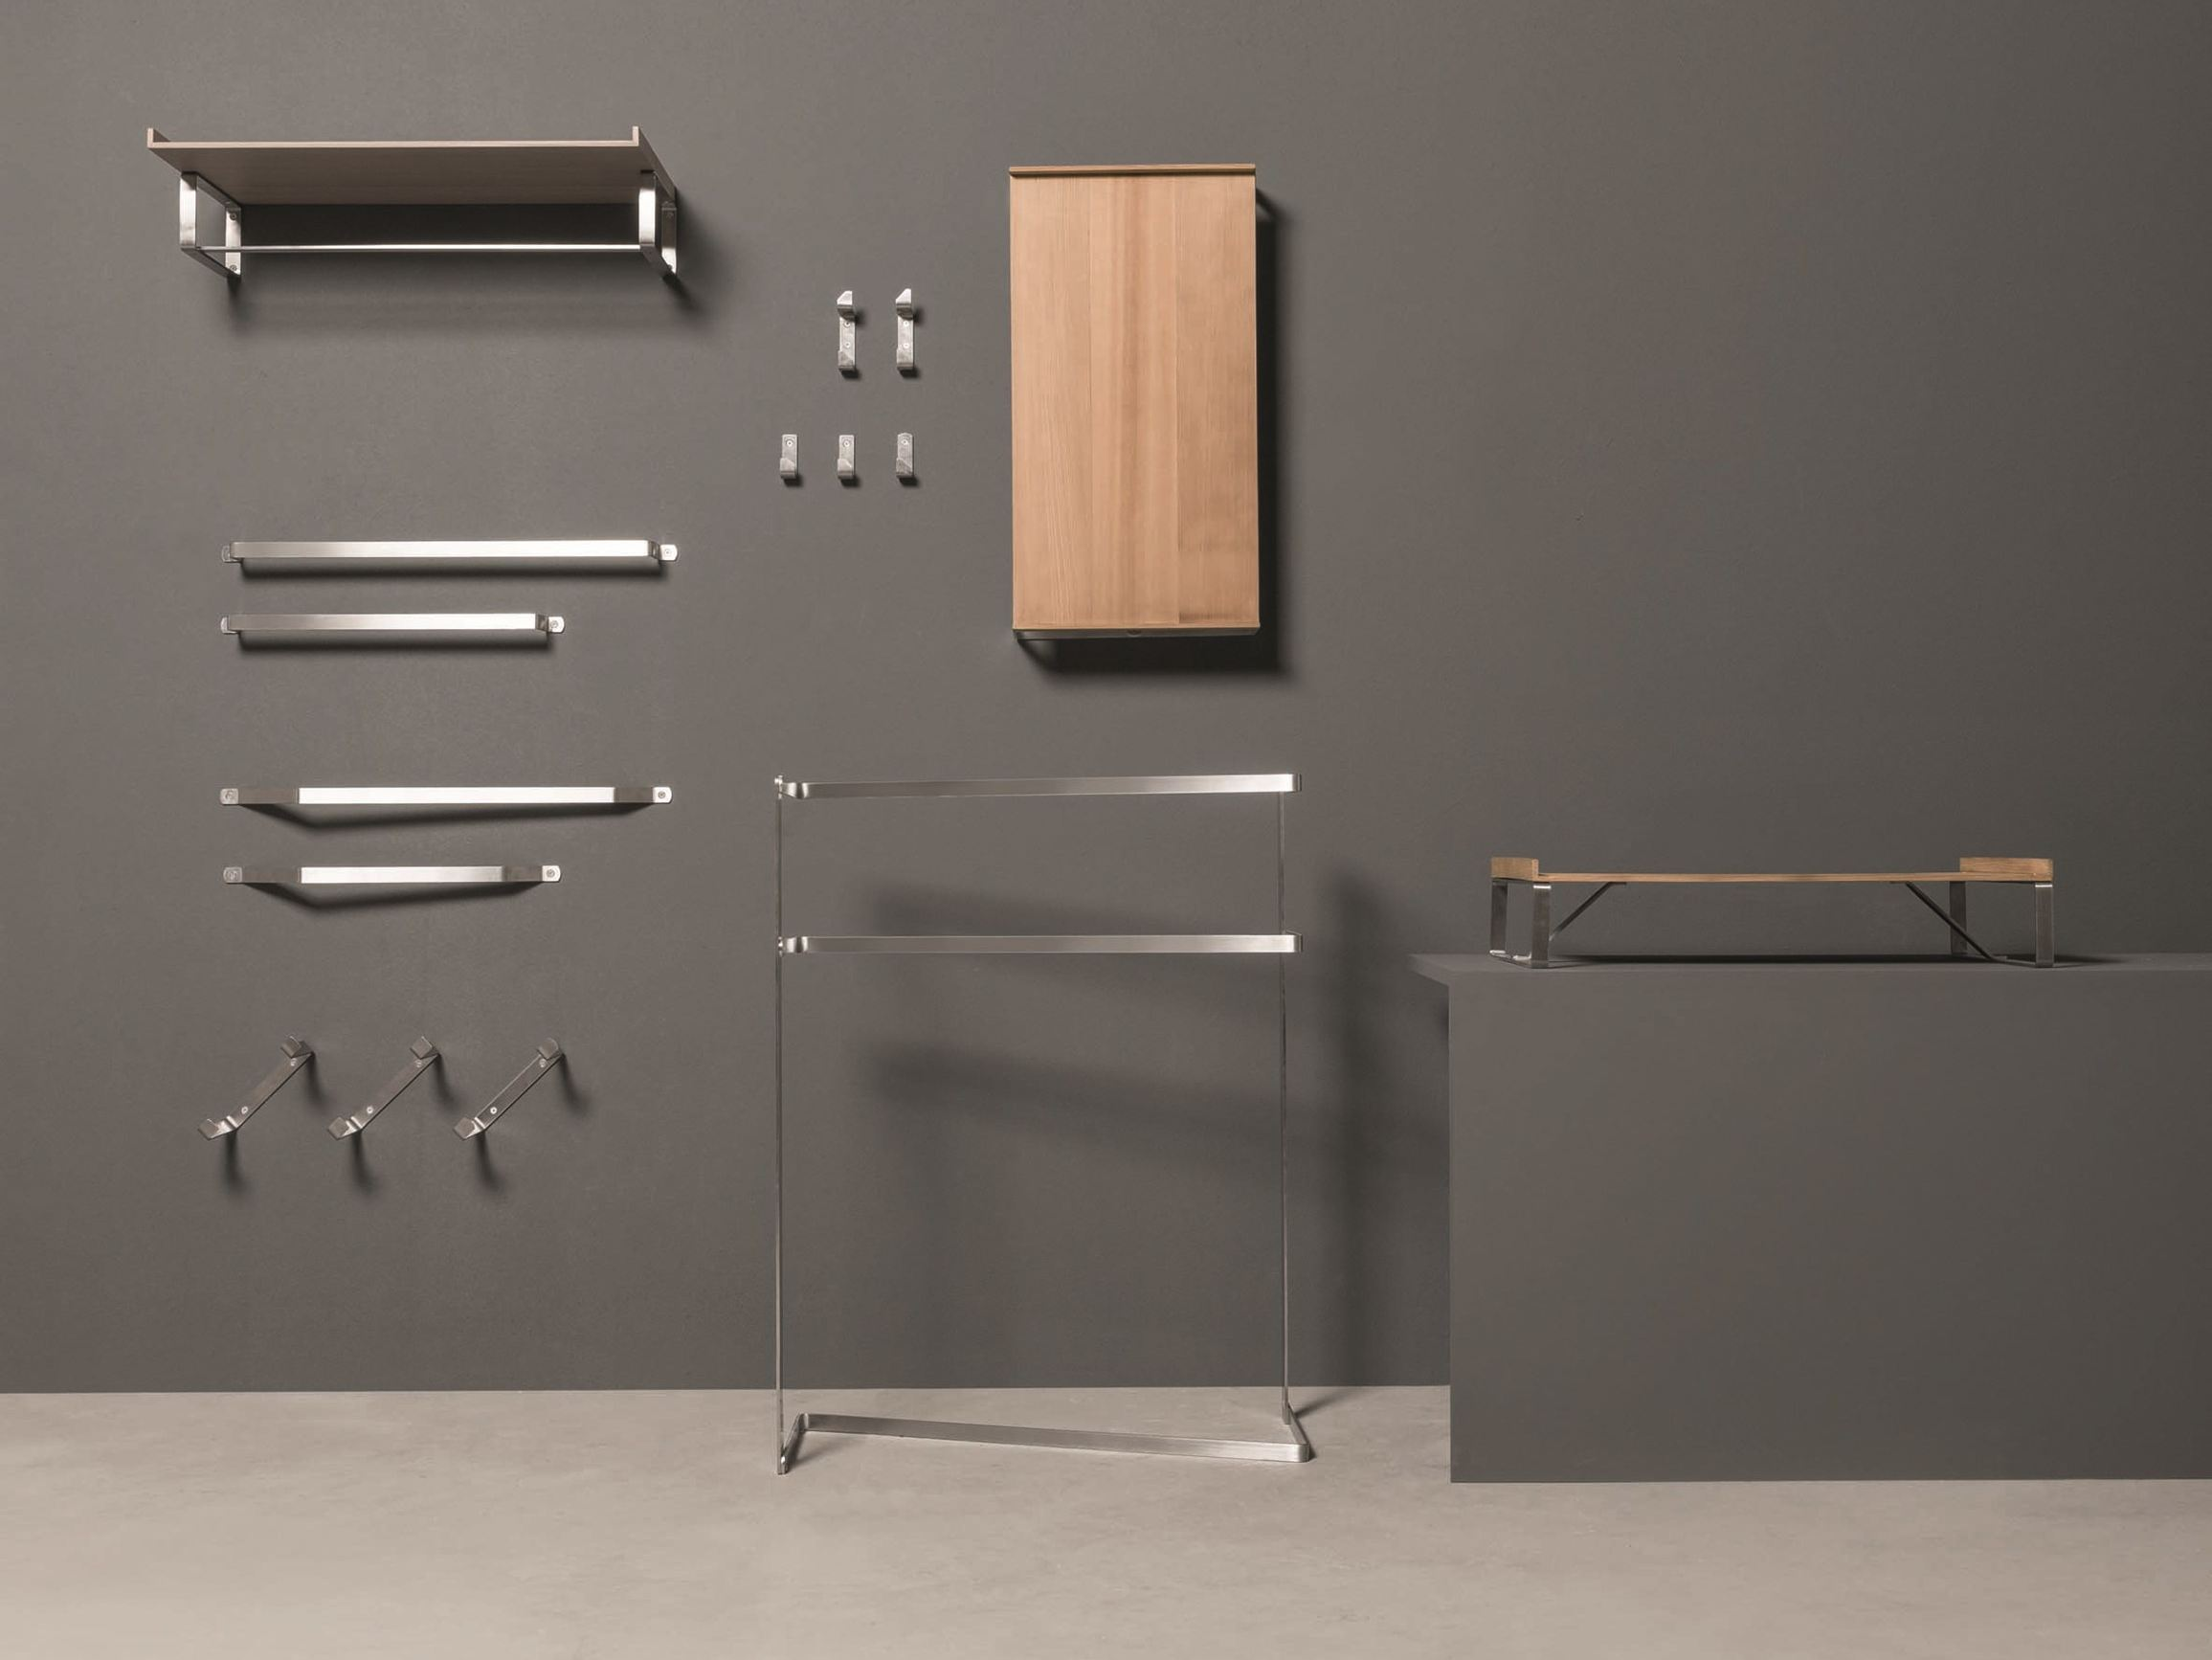 Porta asciugamani a barra da terra collezione twenty by makro design giulio gianturco - Porta asciugamani da bagno ...